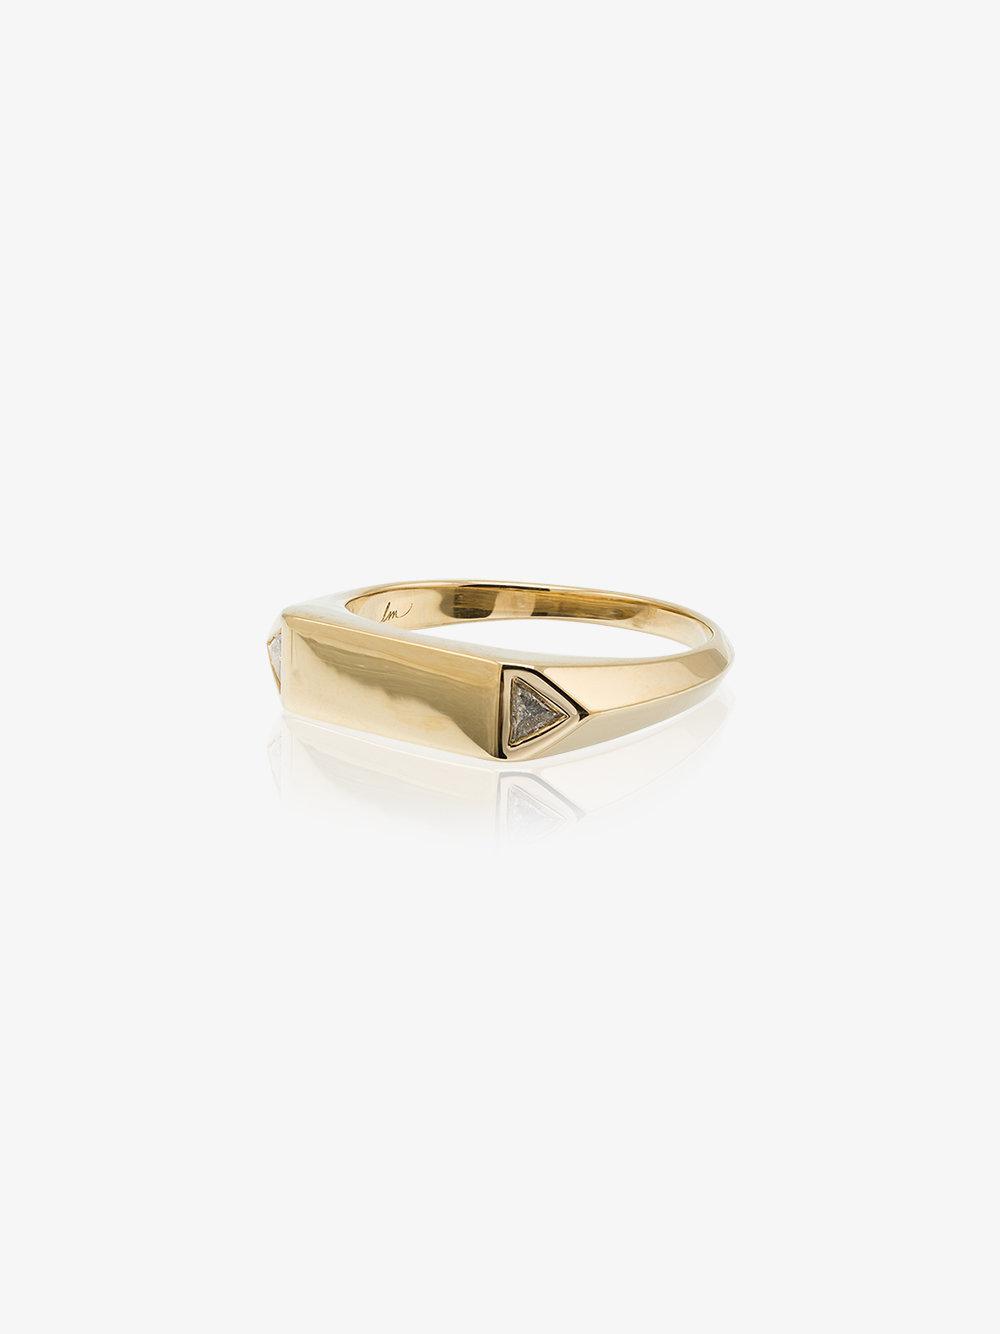 Lizzie Mandler Pave Diamond Overlap Pinky Ring - Metallic TJuarCqf